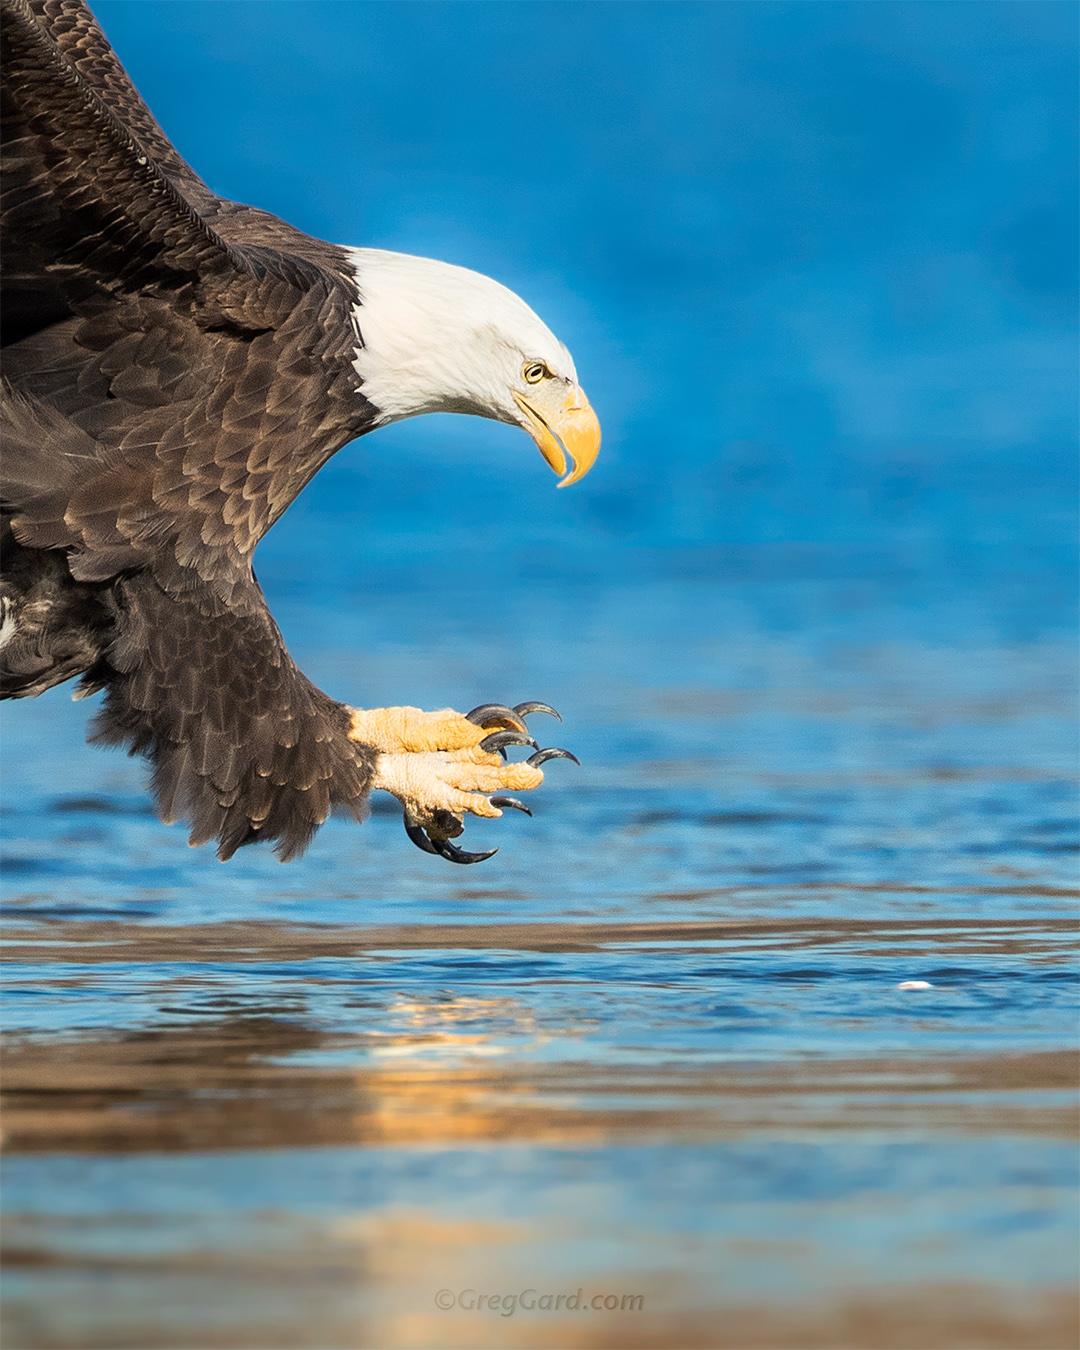 Bald Eagle spreading talons to grab a fish - Conowingo Dam, Port Deposit, MD